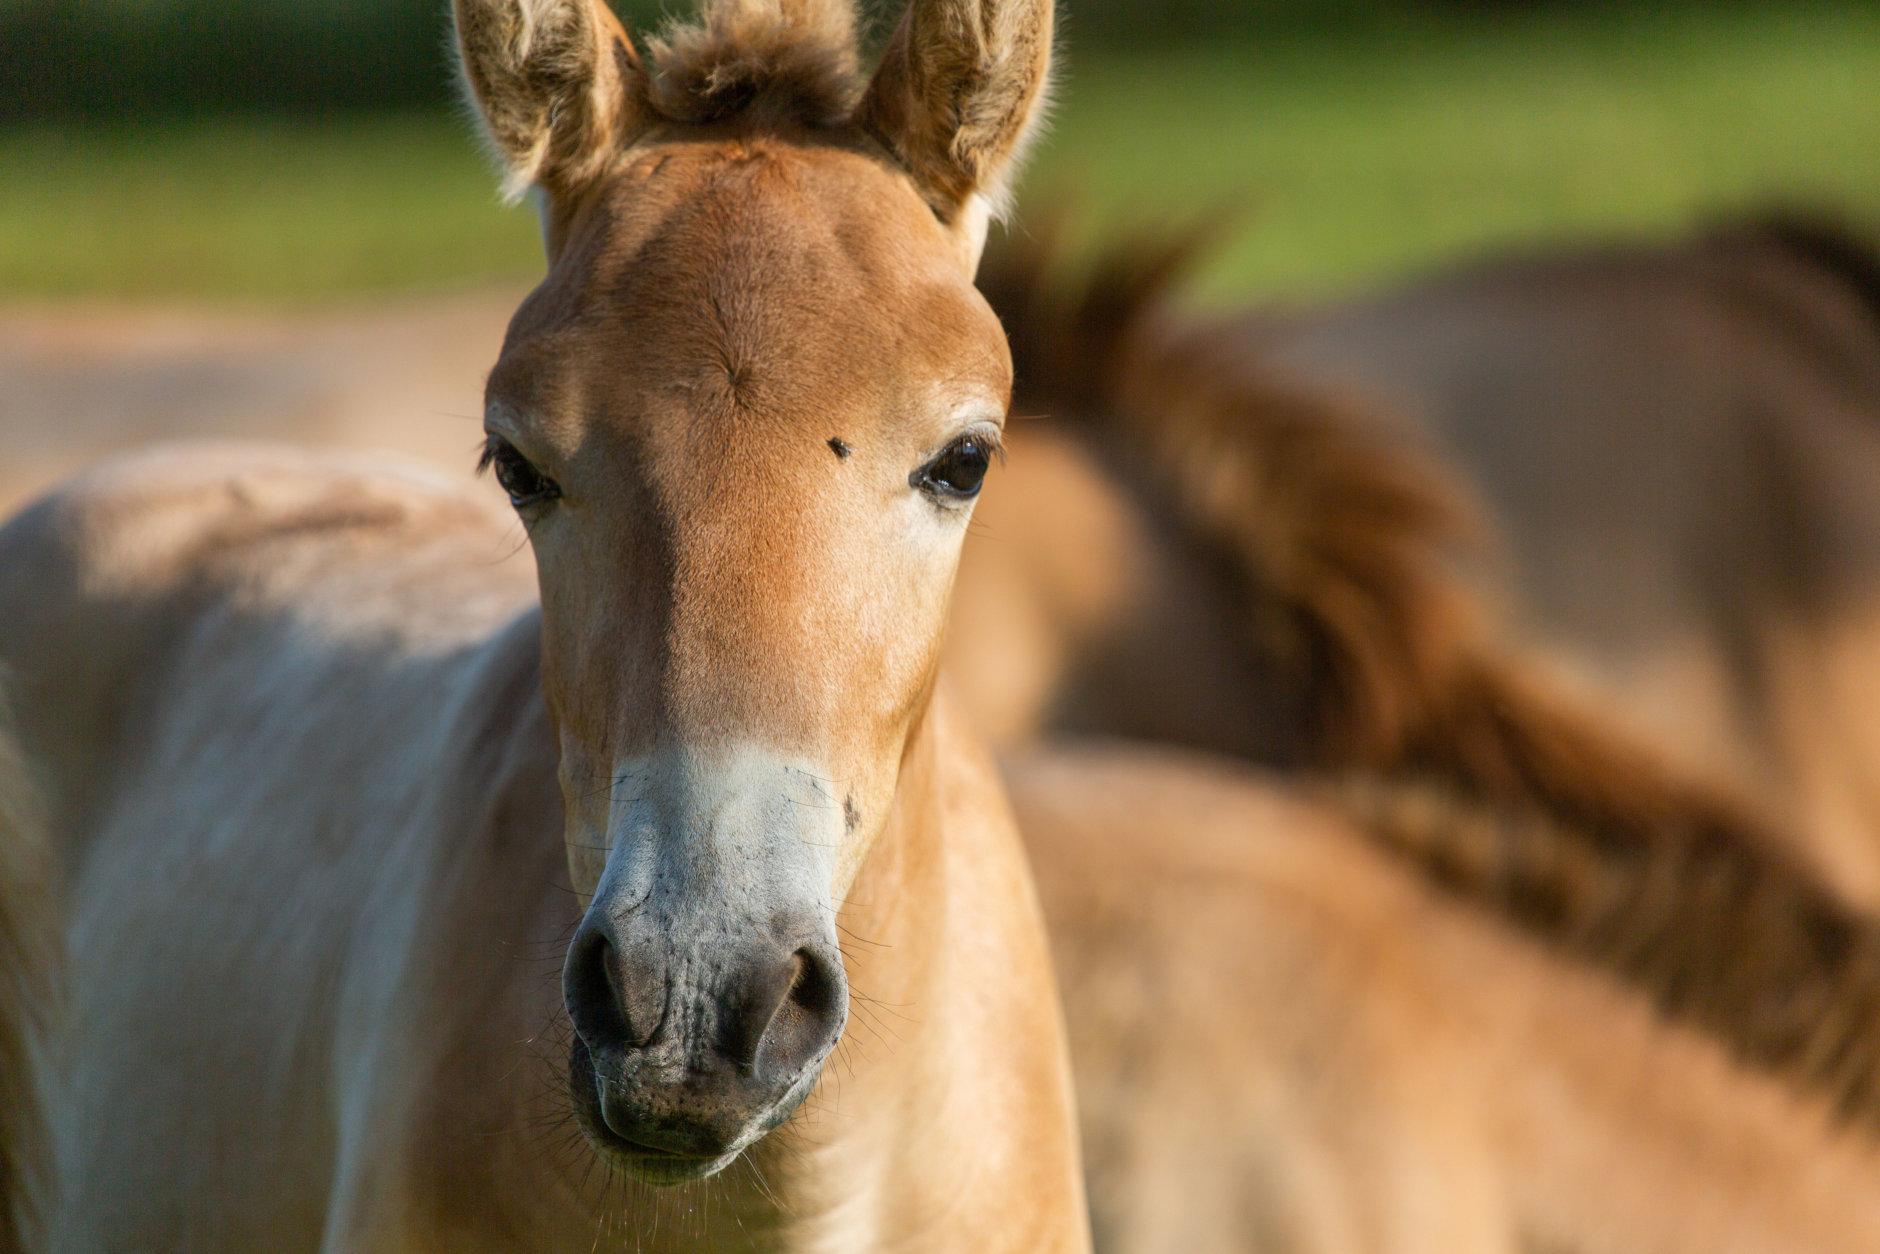 Gobi Wan Kenobi, an endangered Przewalski's horse colt at the Smithsonian Conservation Biology Institute